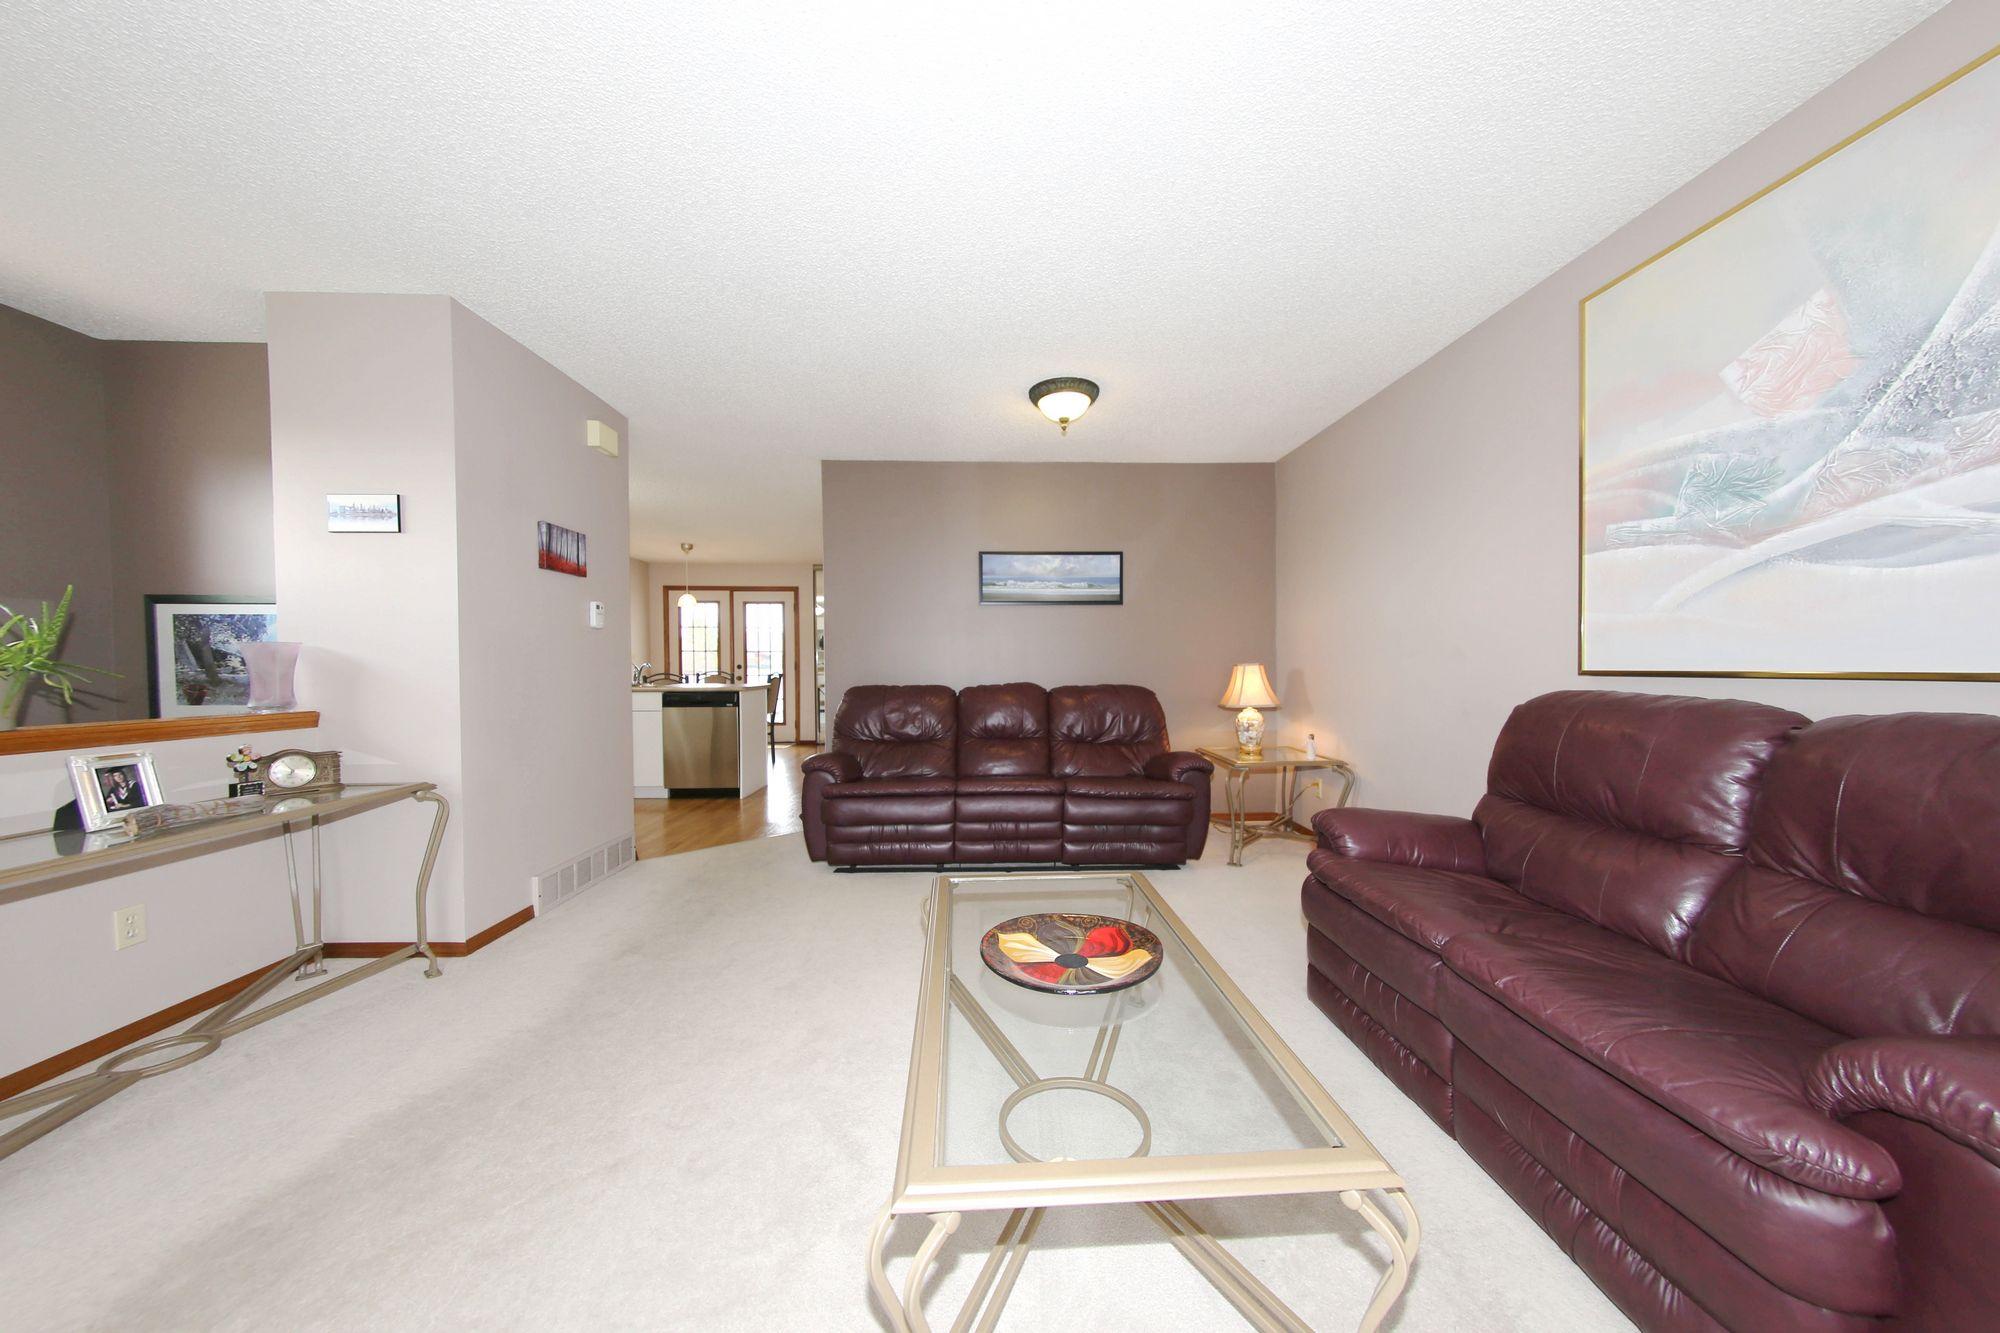 57 Chisholm Drive, Winnipeg, Manitoba  R2R 2T7 - Photo 4 - 1709467